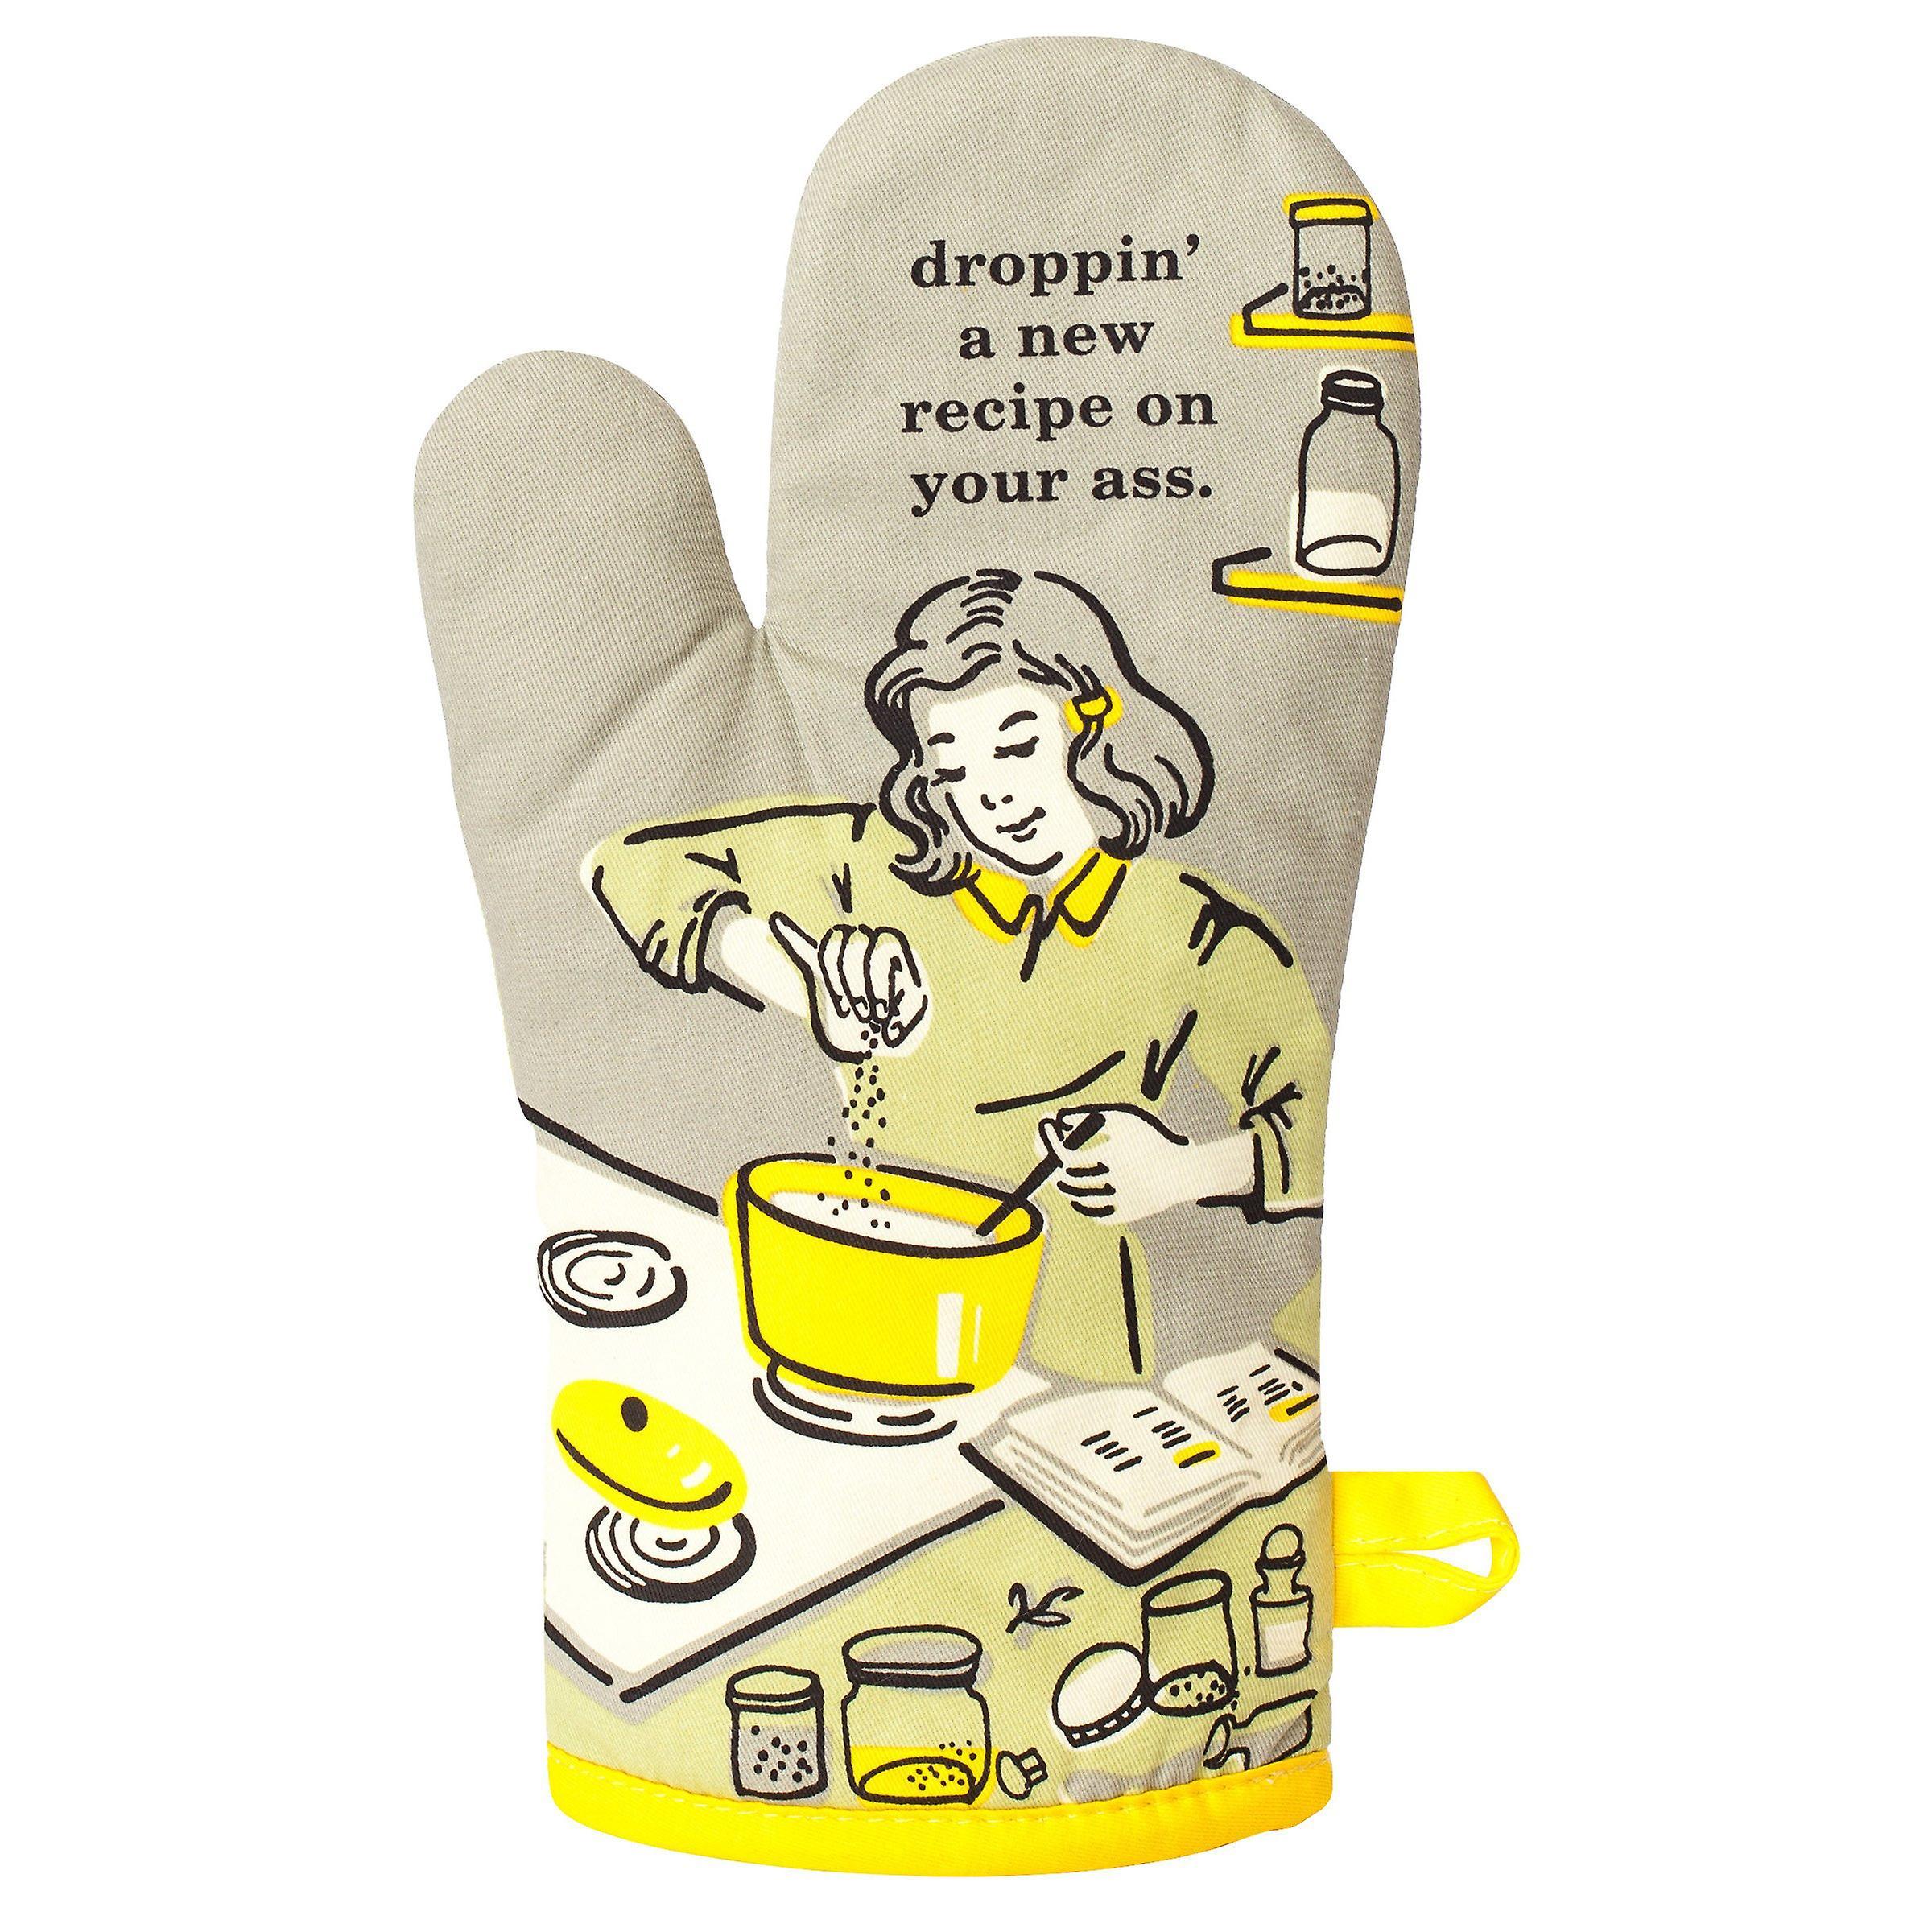 Blue q - droppin' a recipe on your ass over mitt